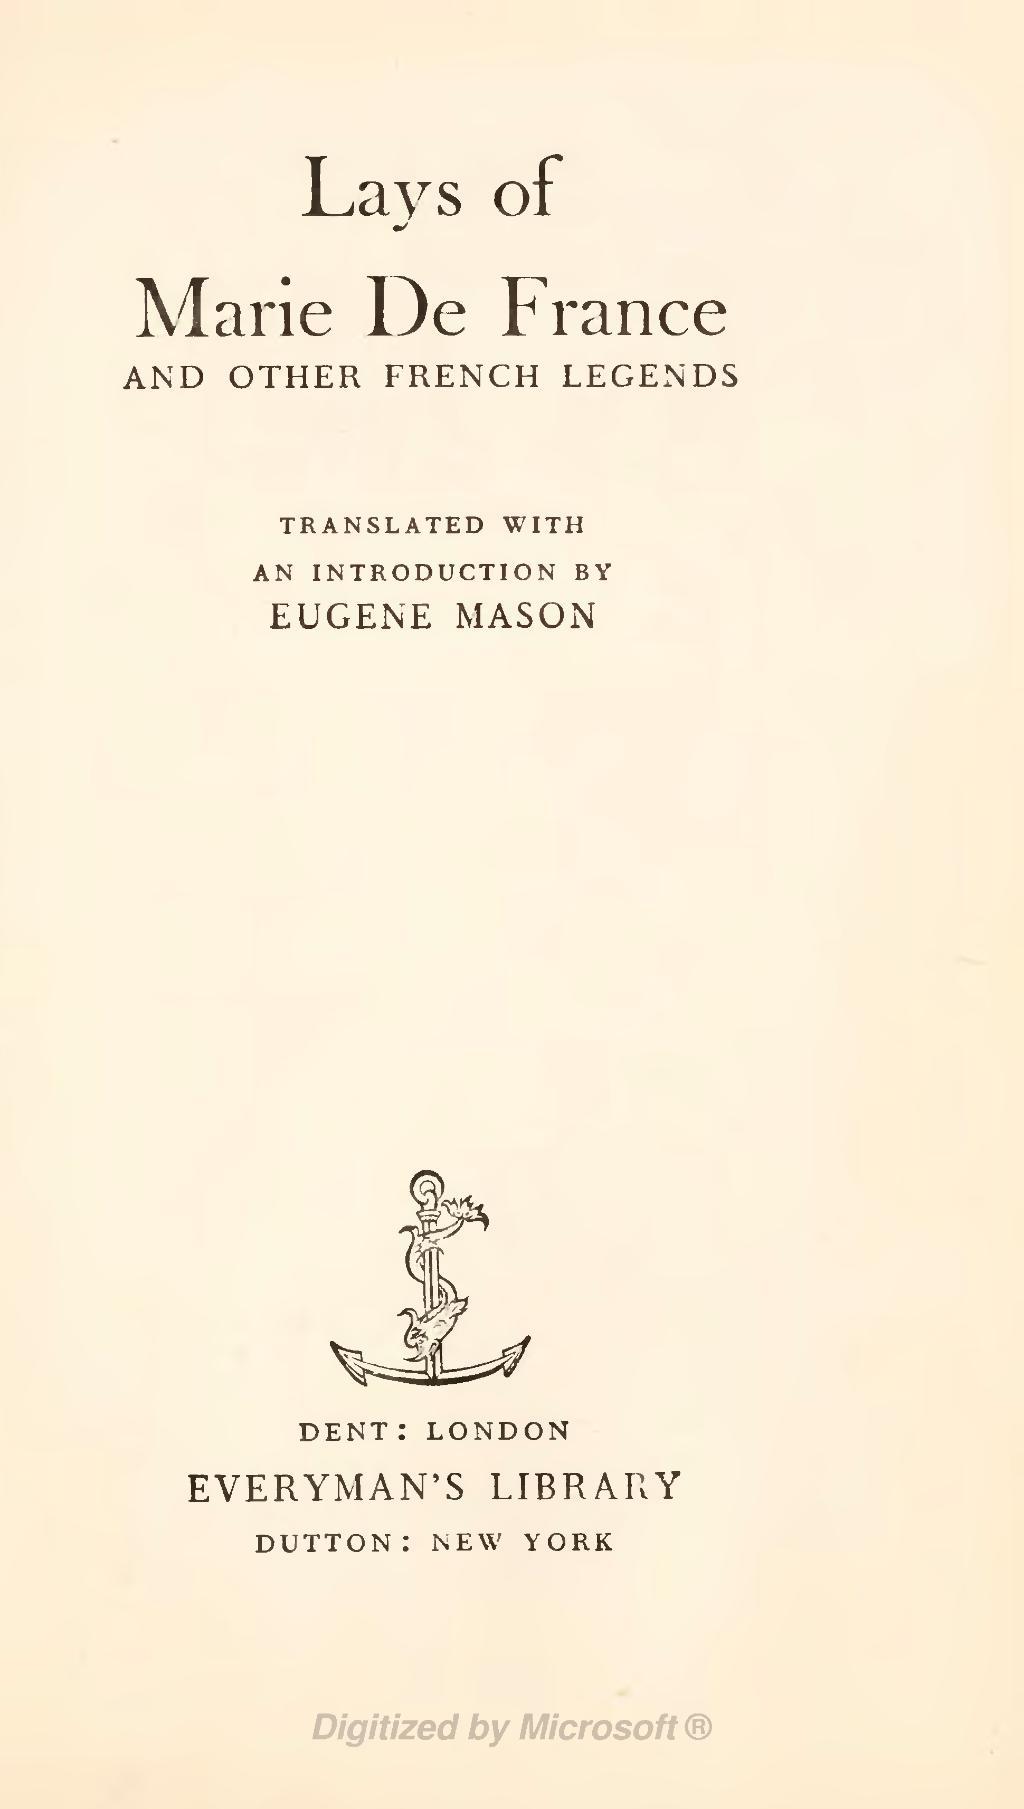 a review of feminism in lanval a book by marie de france Sharon kinoshita 'cherchez la femme': feminist criticism and marie de france's lai de lanval, romance notes 34 (1994): 263 [263-73] google scholar 19.